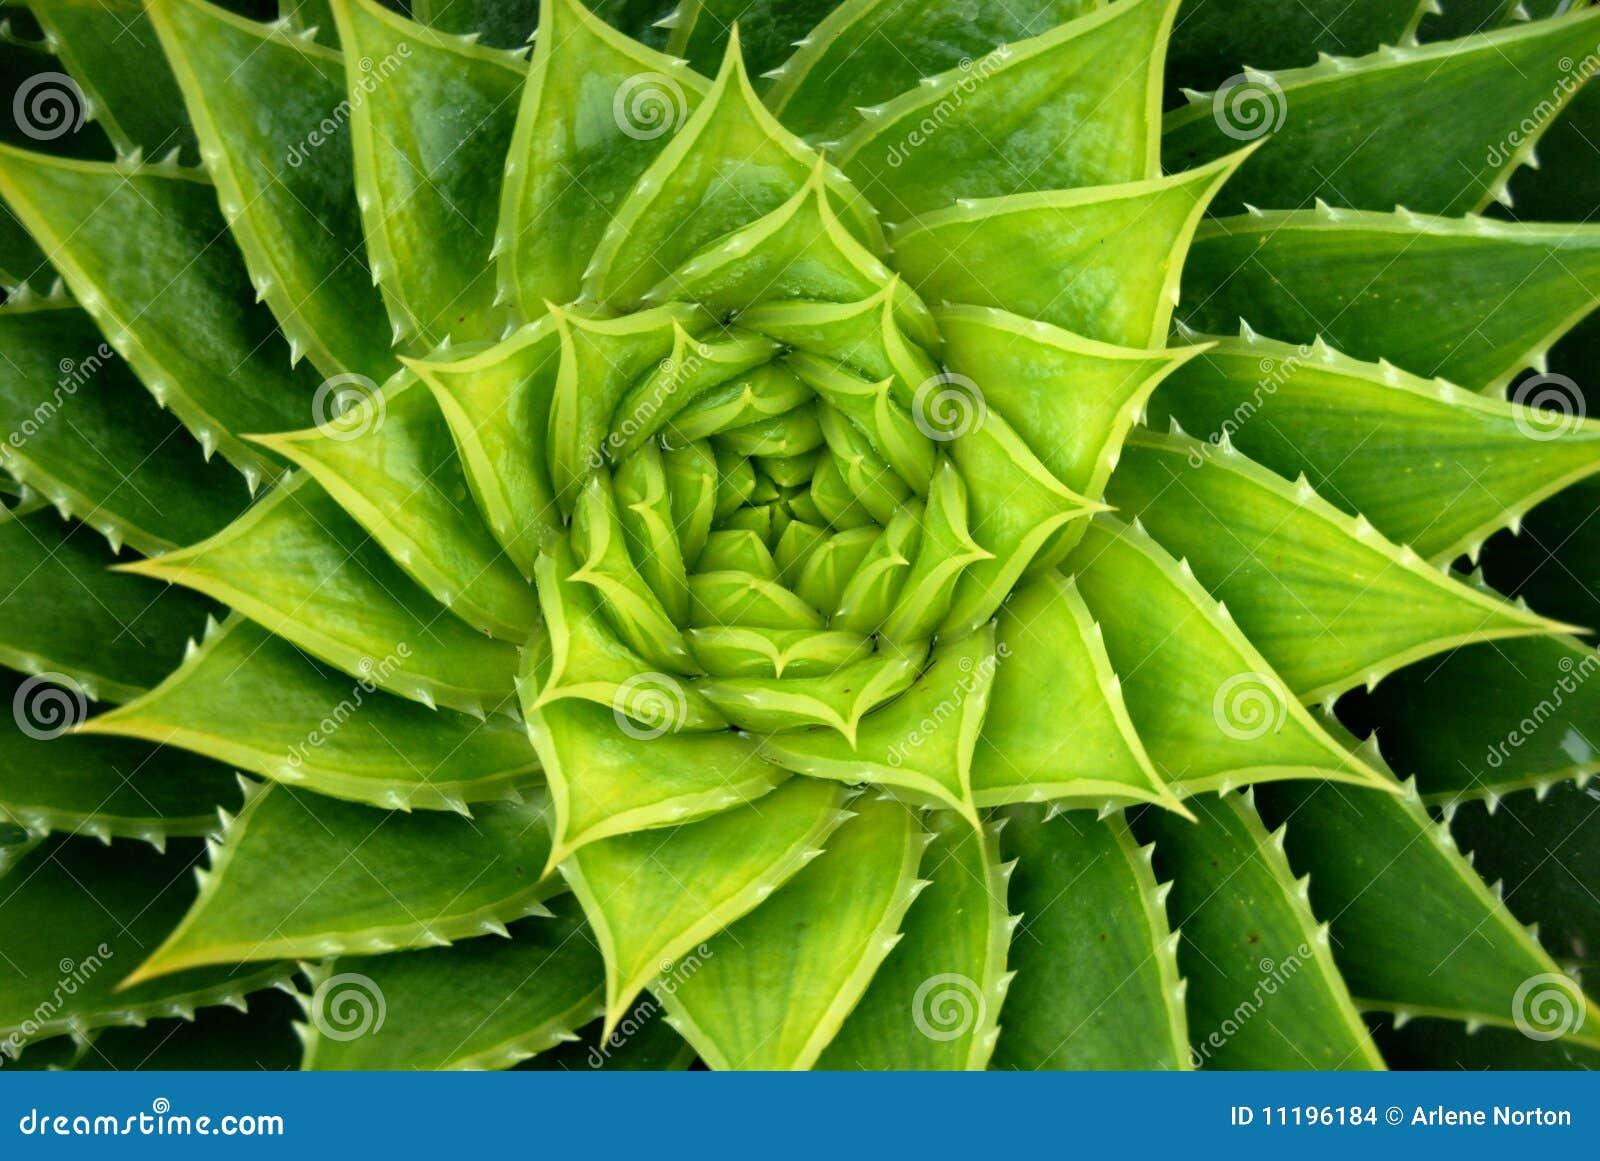 Vivid Green Spiral Aloe Plant